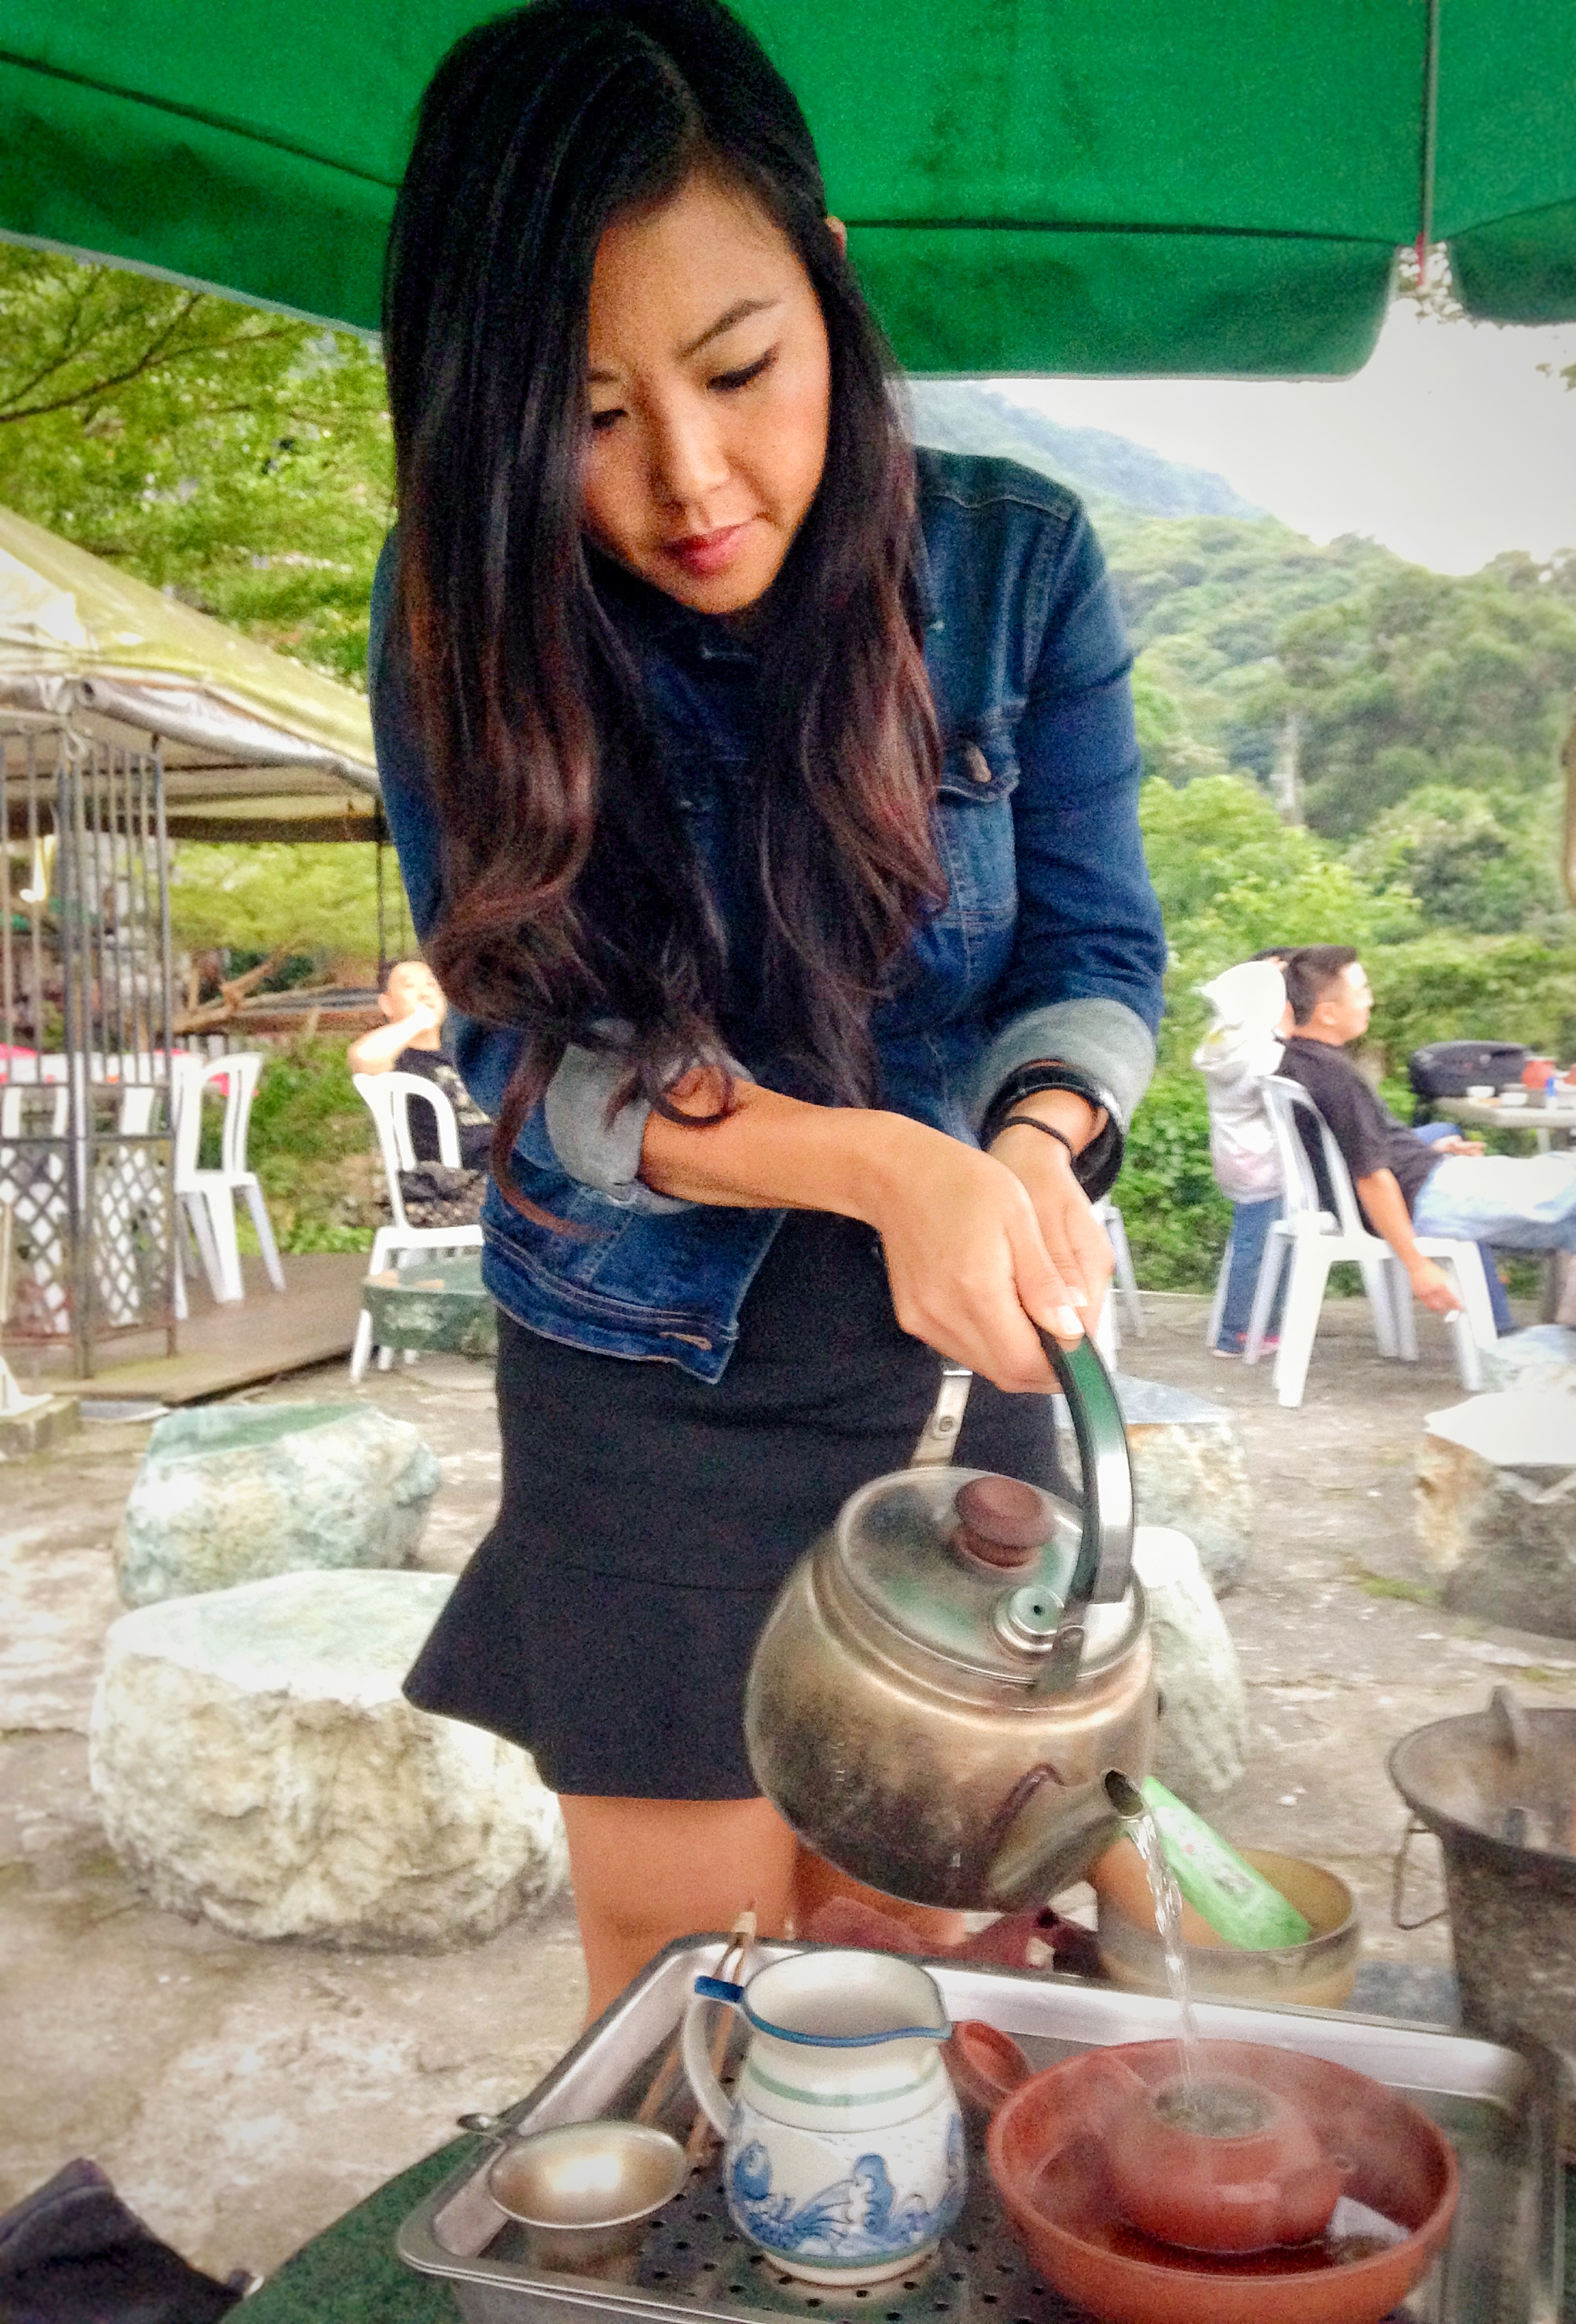 Taiwan - Pouring Tea